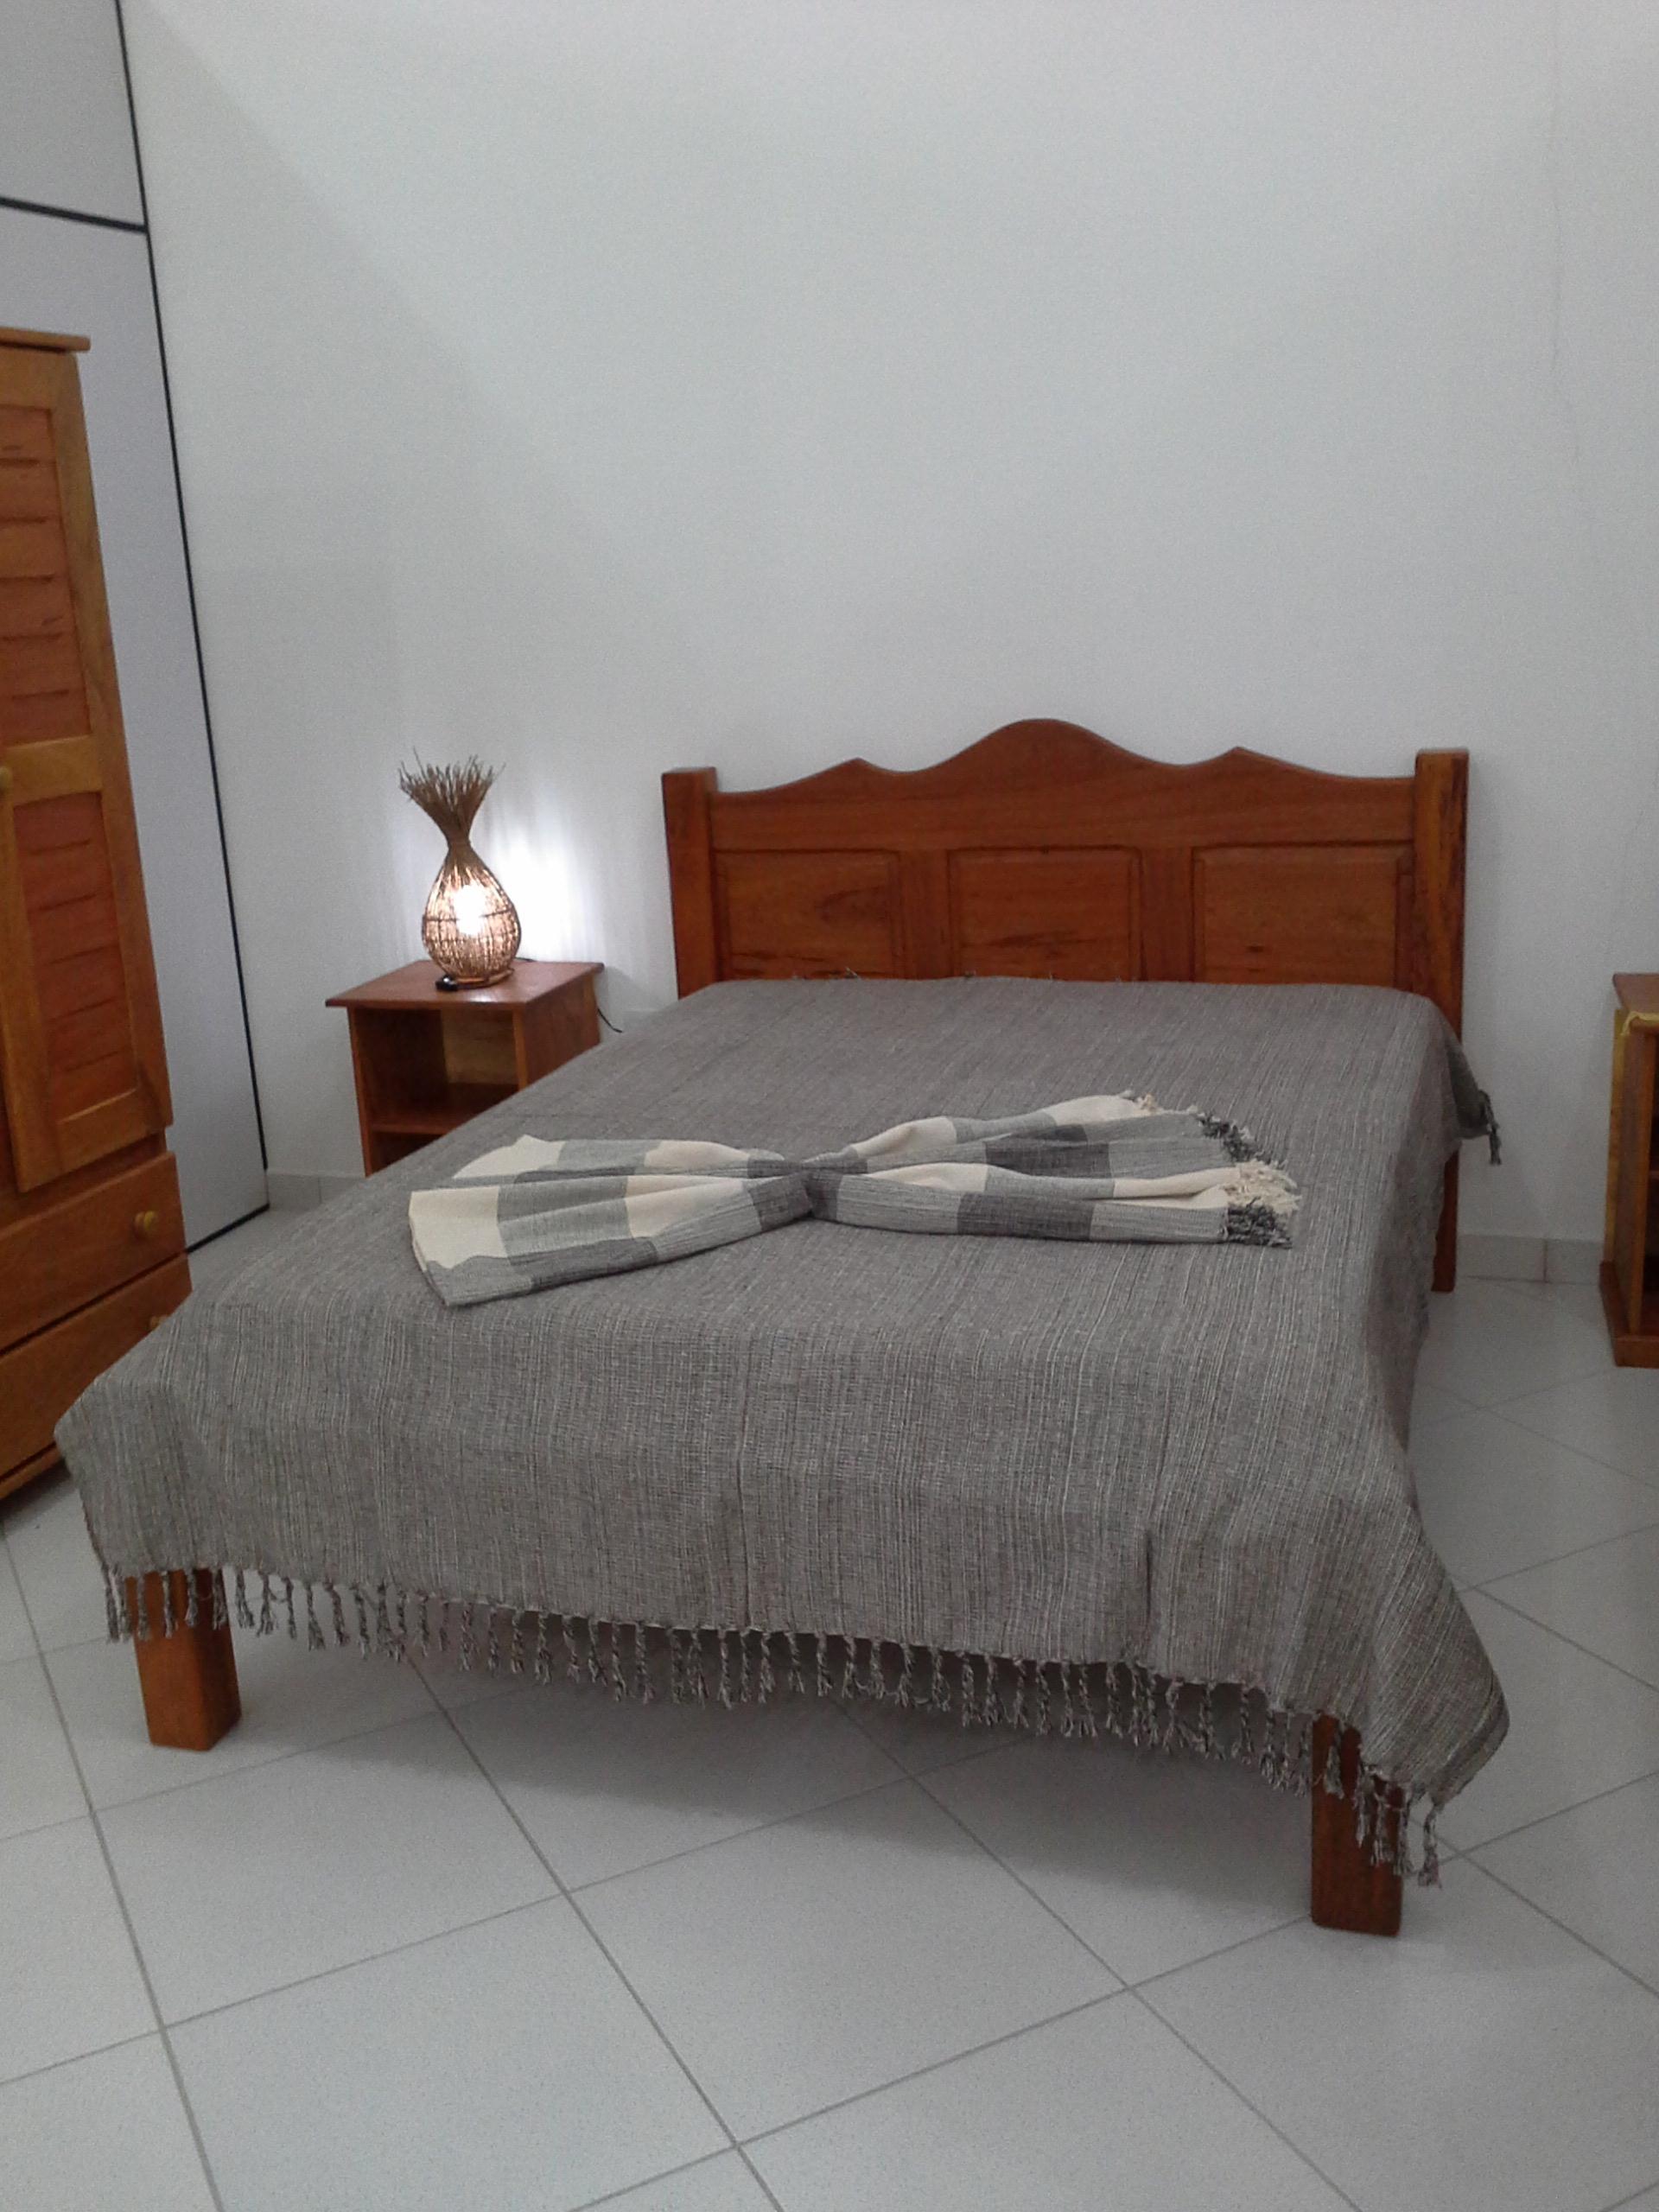 Cama Almofadada 2